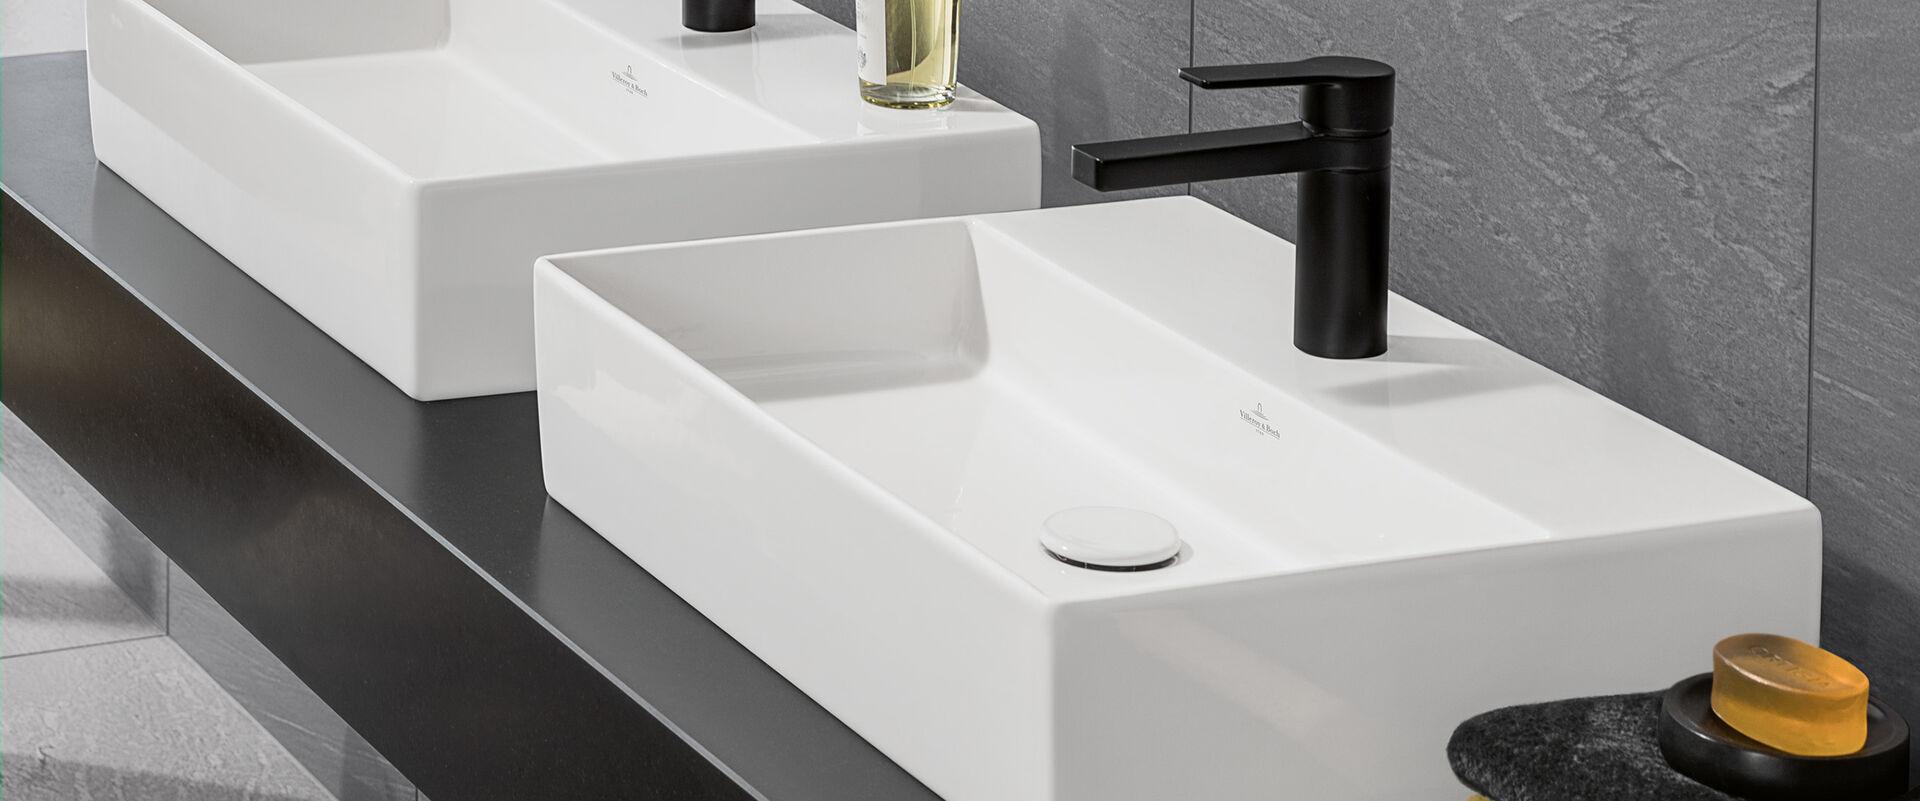 Waschbecken: Villeroy & Boch Memento 2.0